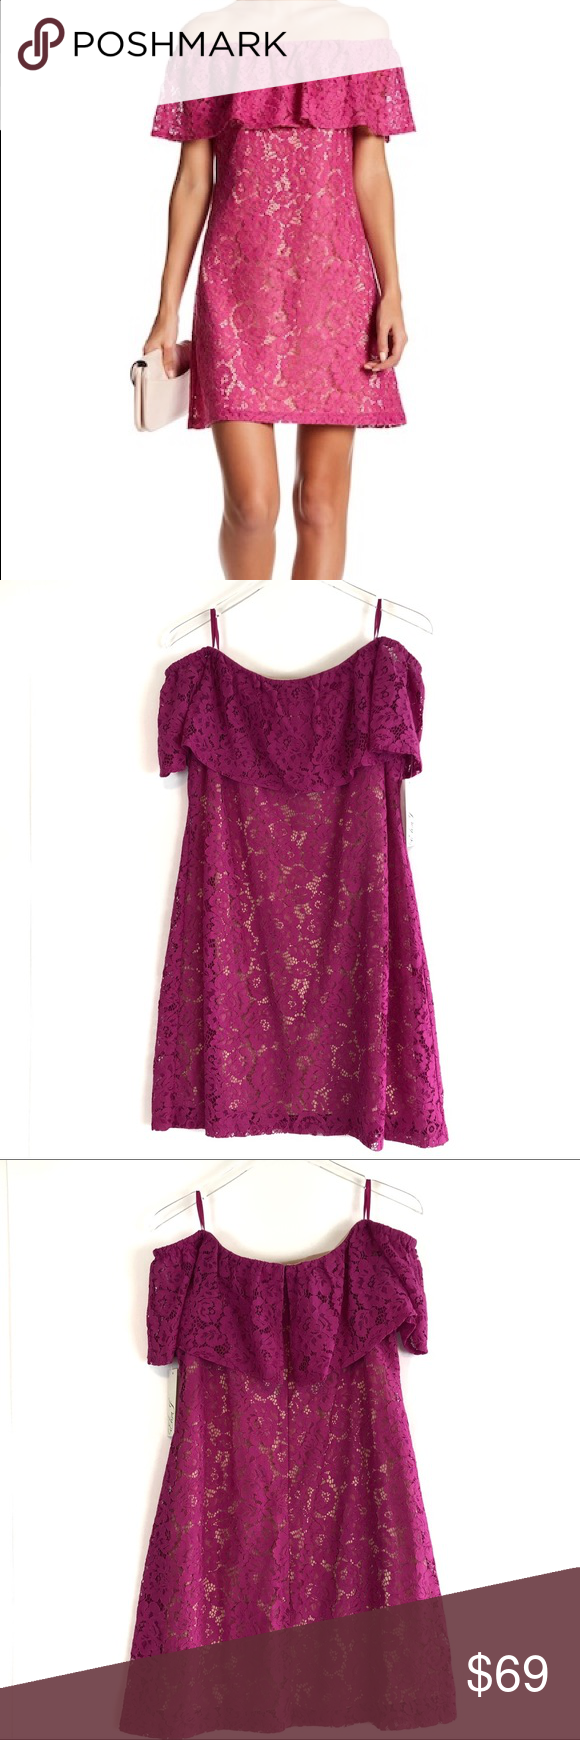 19 Luxury Eliza J Dress Size Chart